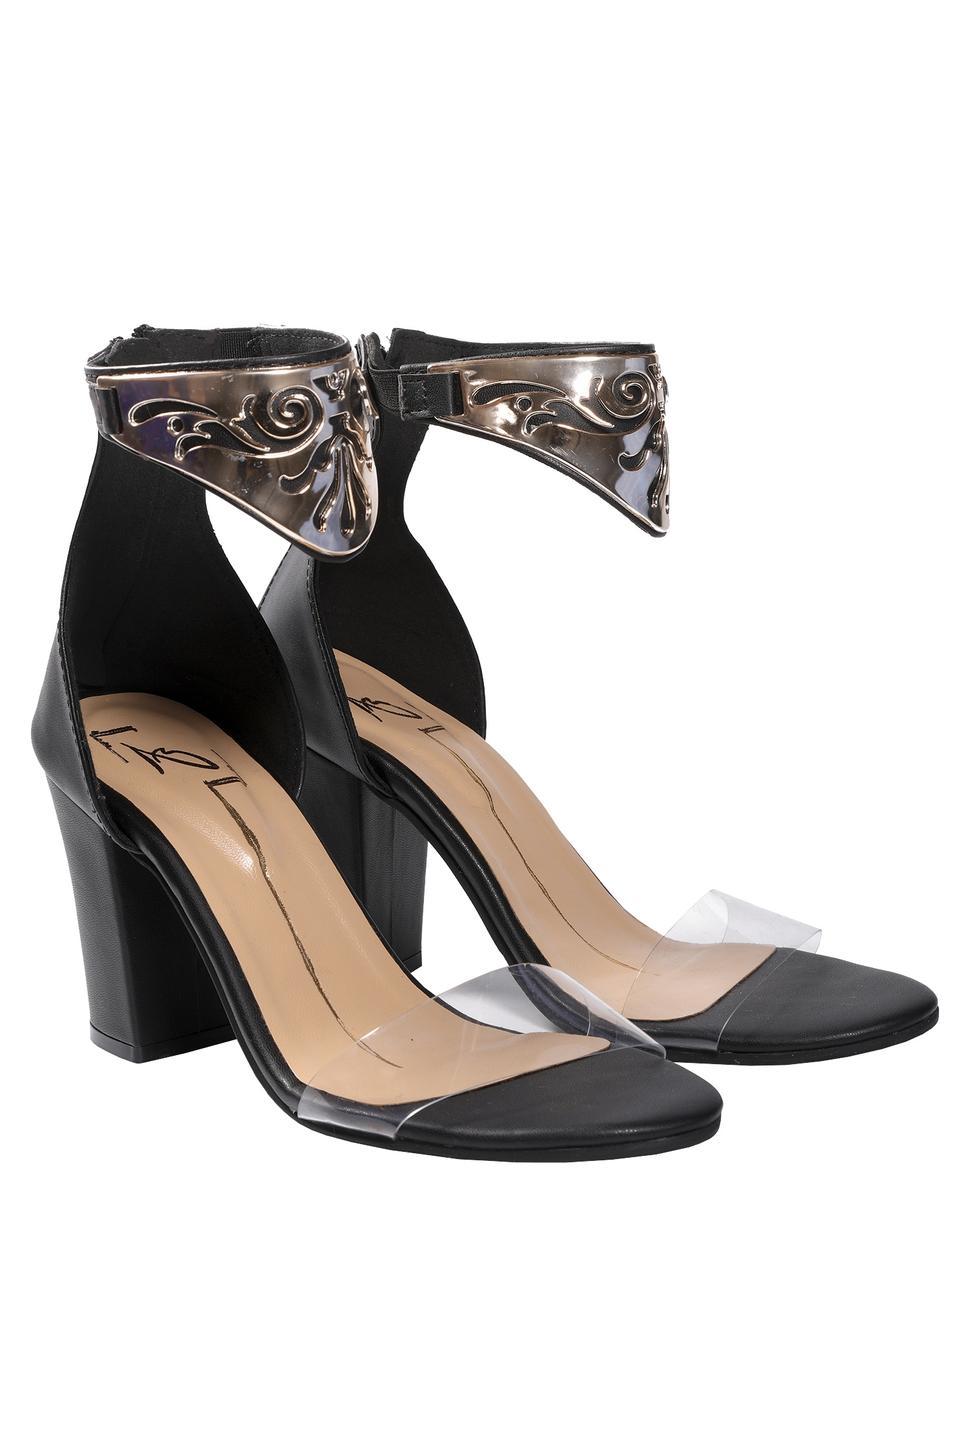 Laser Cut Heels